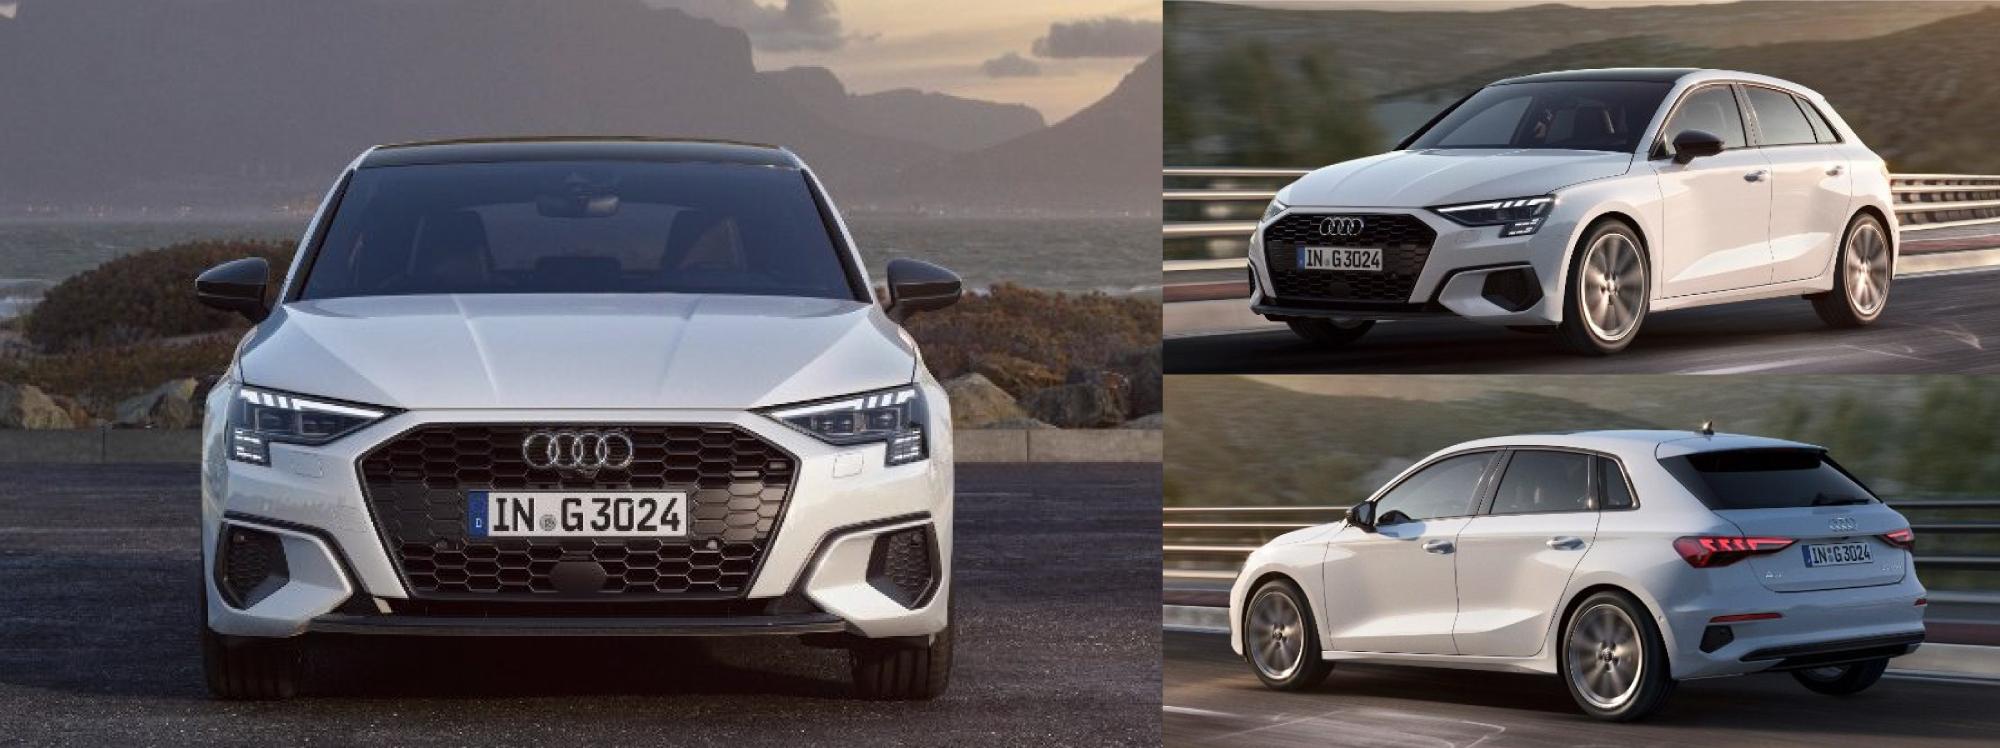 Audi lanza al ruedo al A3 Sportback 30 g-tron